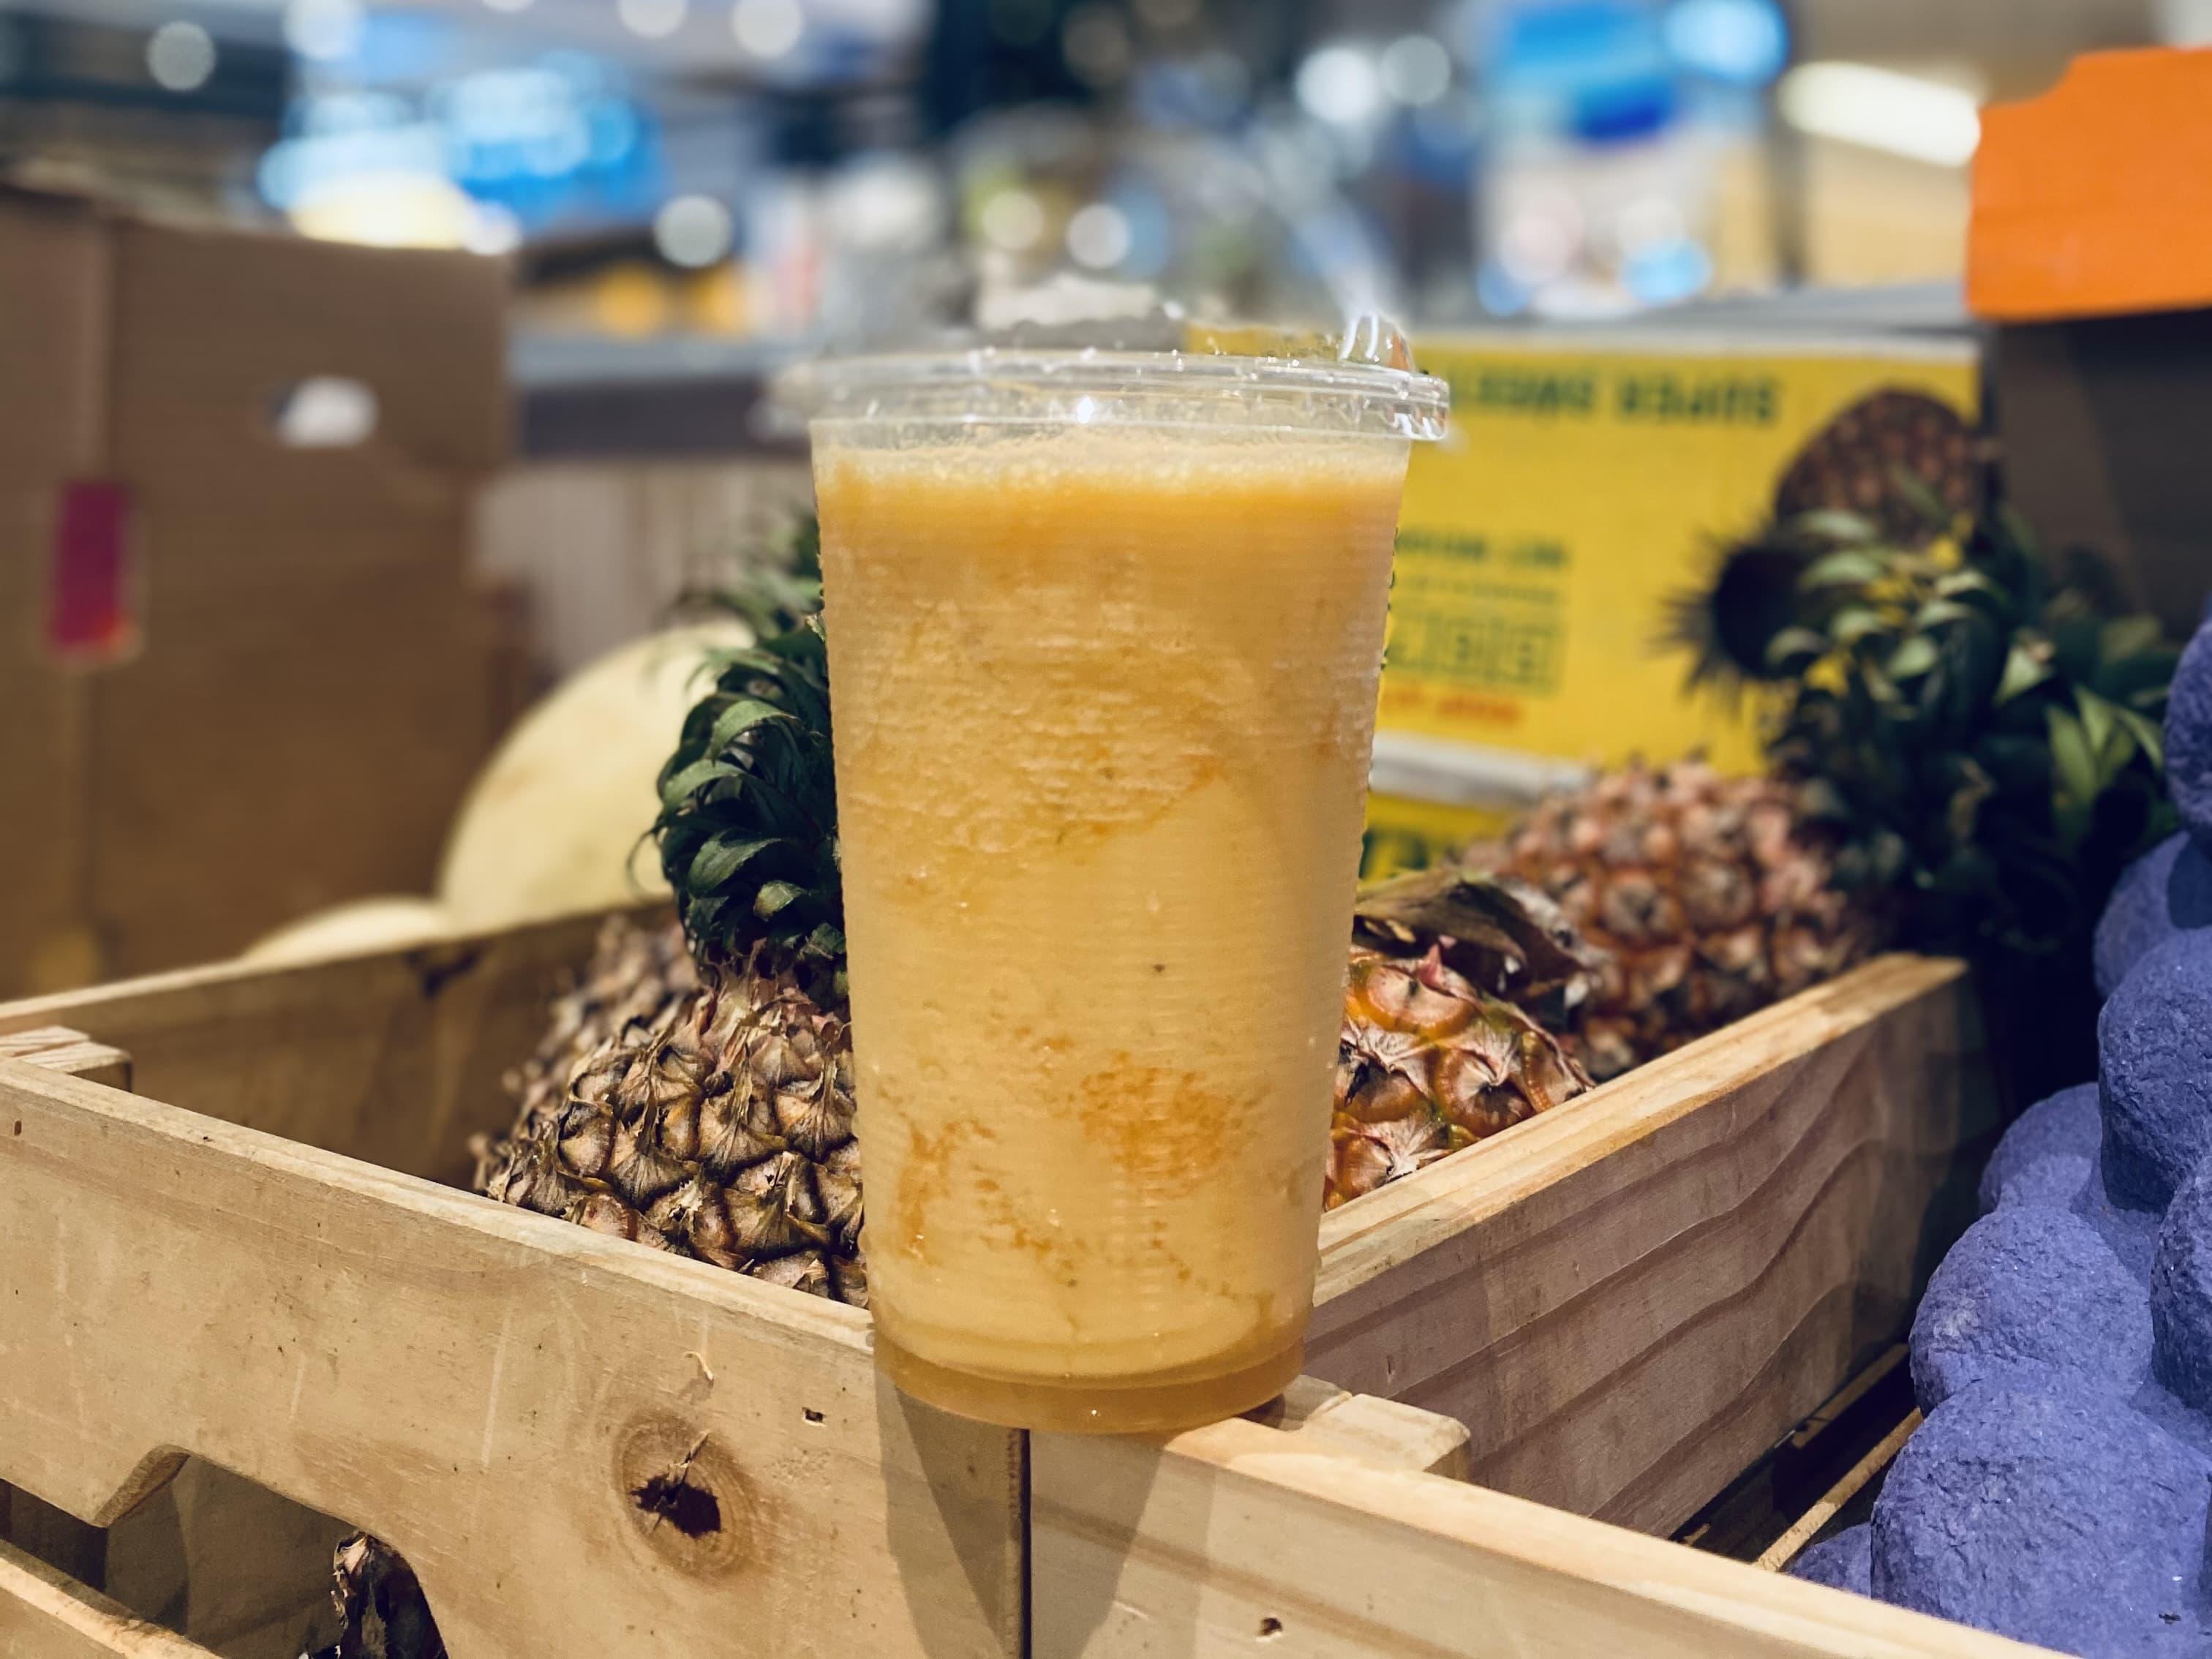 1 x Hawaiian Paradise (Pineapple, Mango, Orange, Banana, Yoghurt)